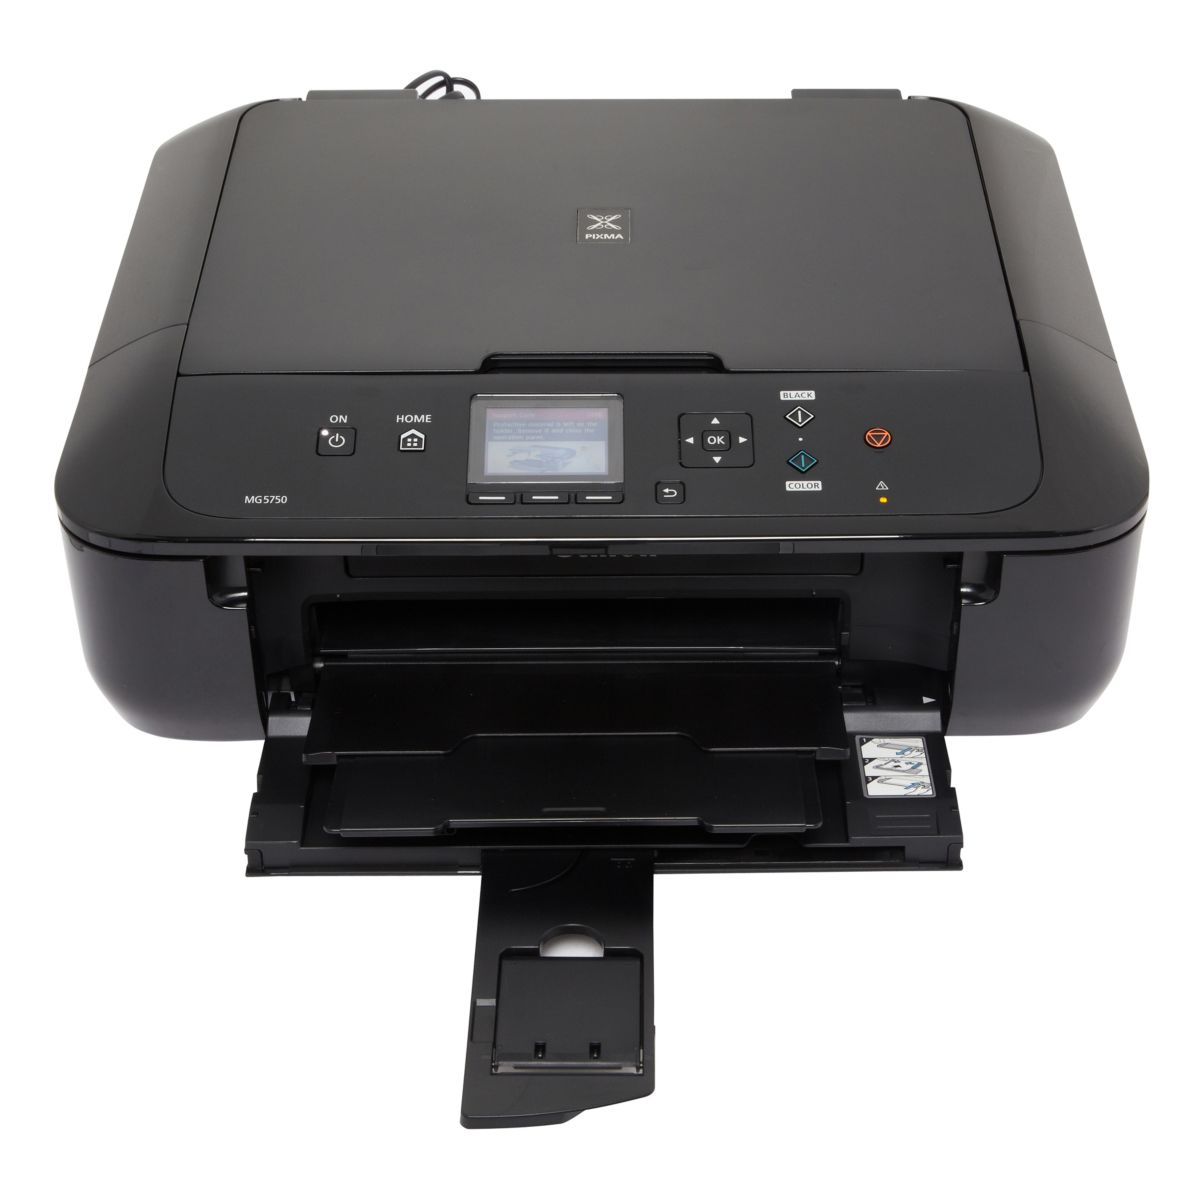 informatique imprimante multifonction jet d 39 encre canon mg5750 noir. Black Bedroom Furniture Sets. Home Design Ideas